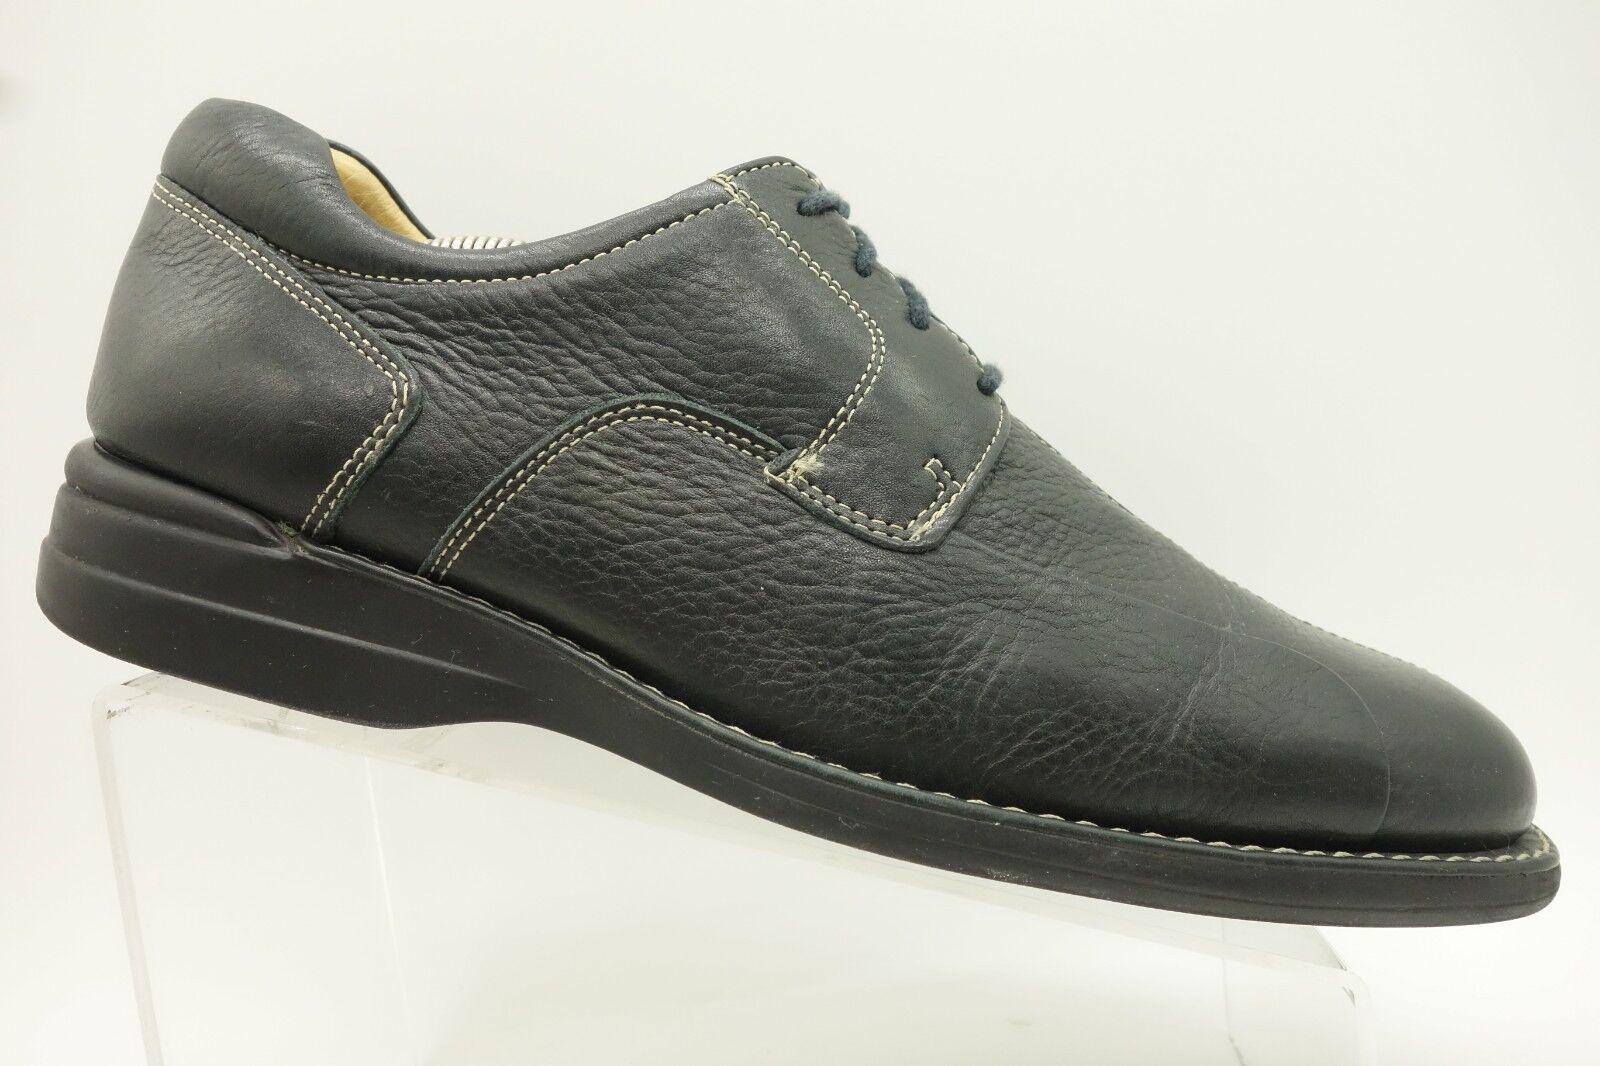 Johnston Murphy Black Leather Casual Split Toe Oxford shoes Mens 10.5 M